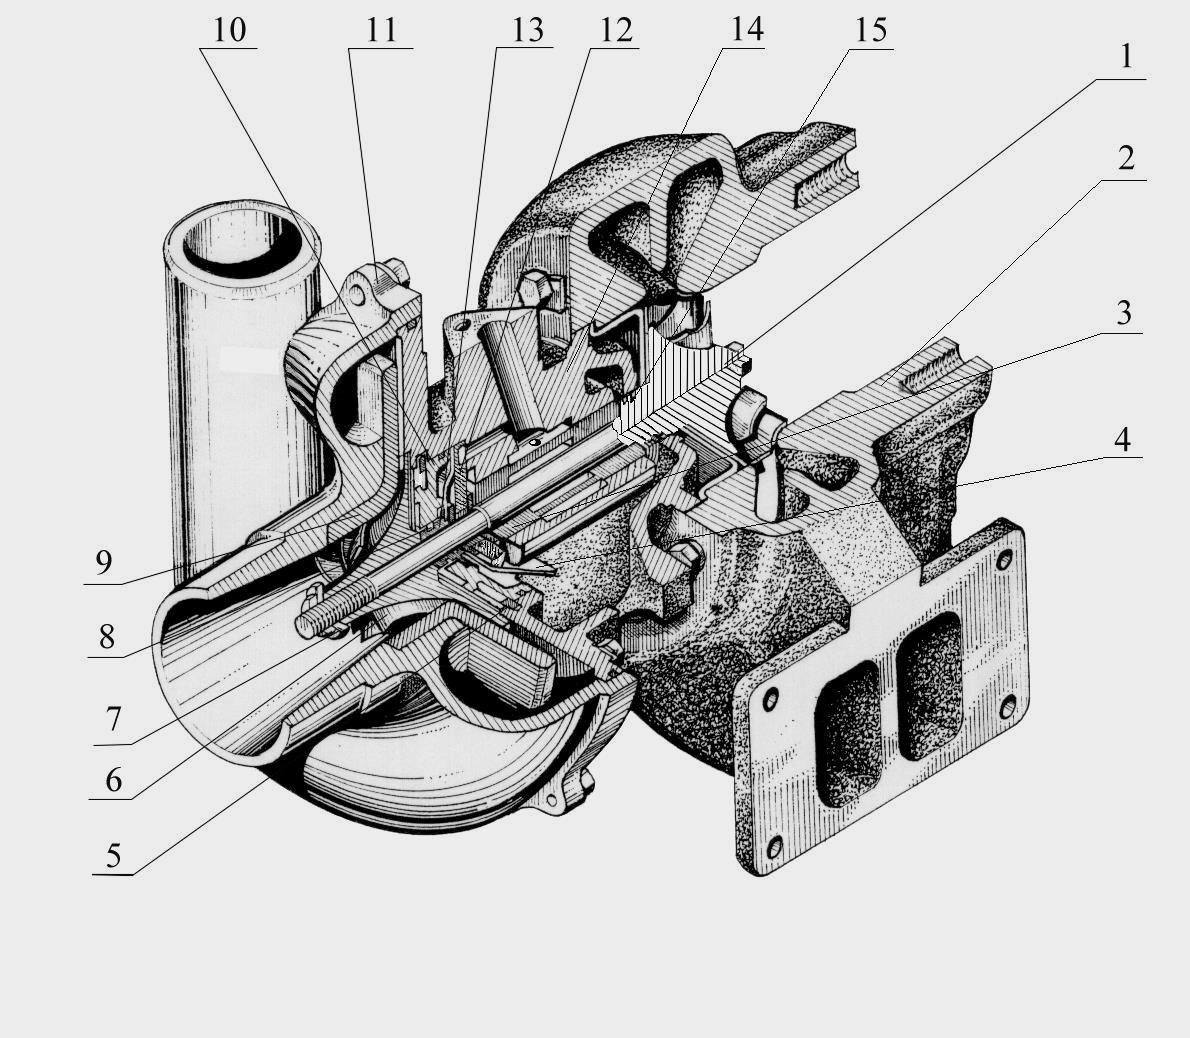 паливна система дизельного двигуна схема